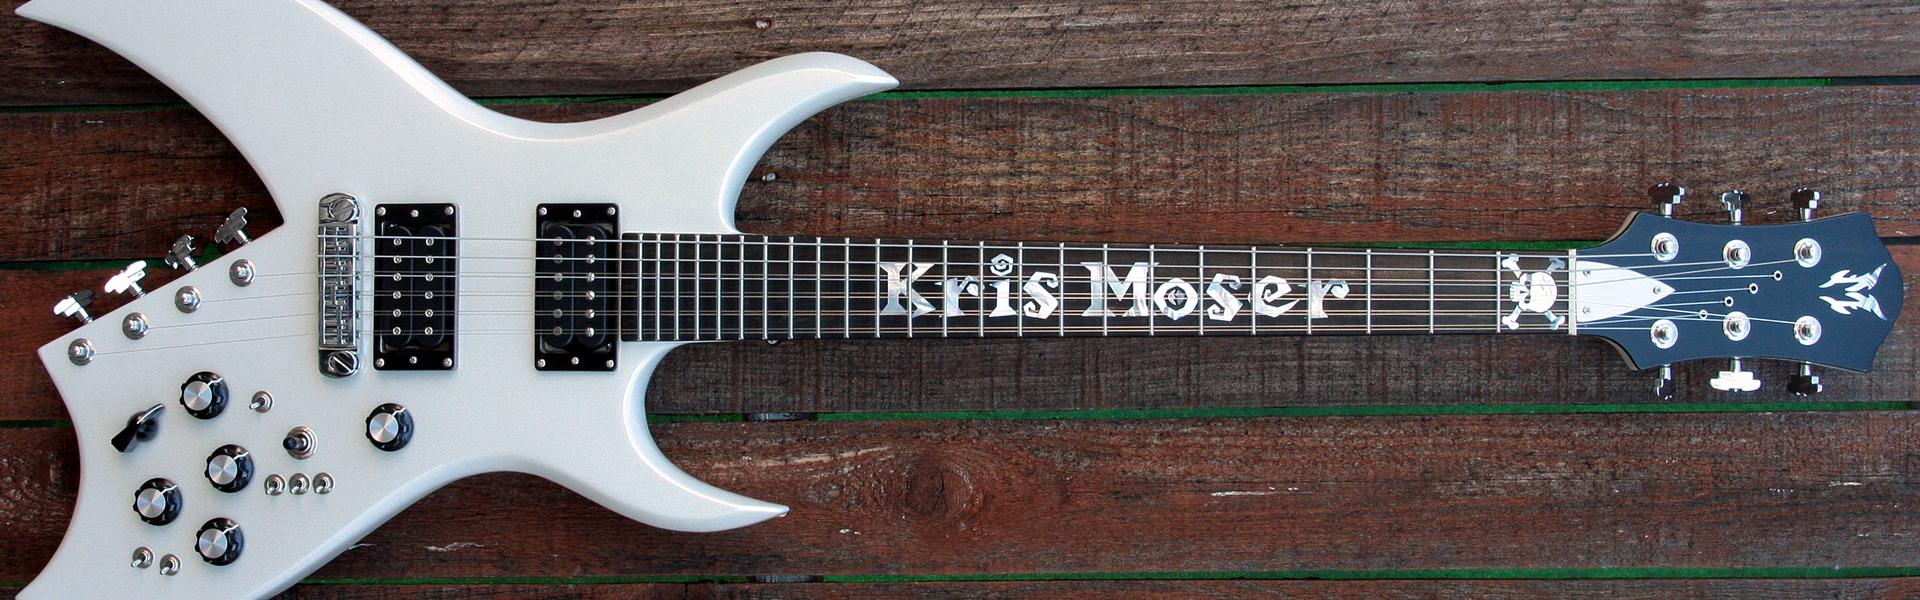 hight resolution of kris moser s moser 10 basilisk guitar